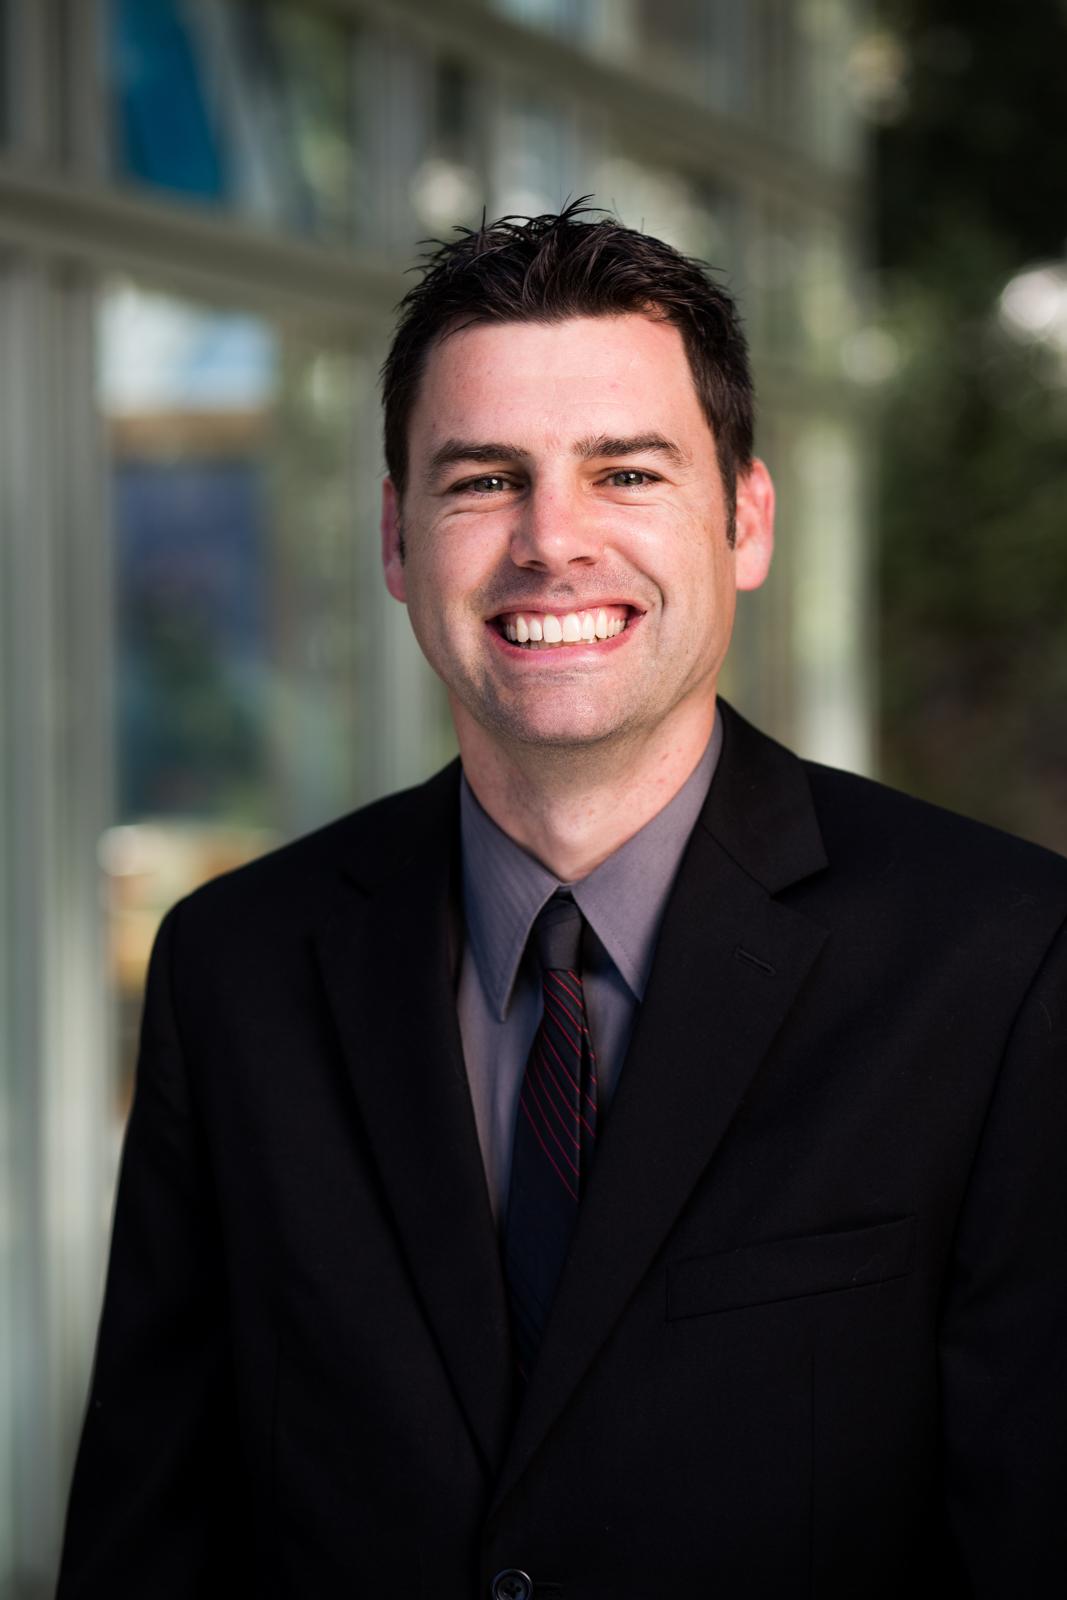 profile image for David Blodgett